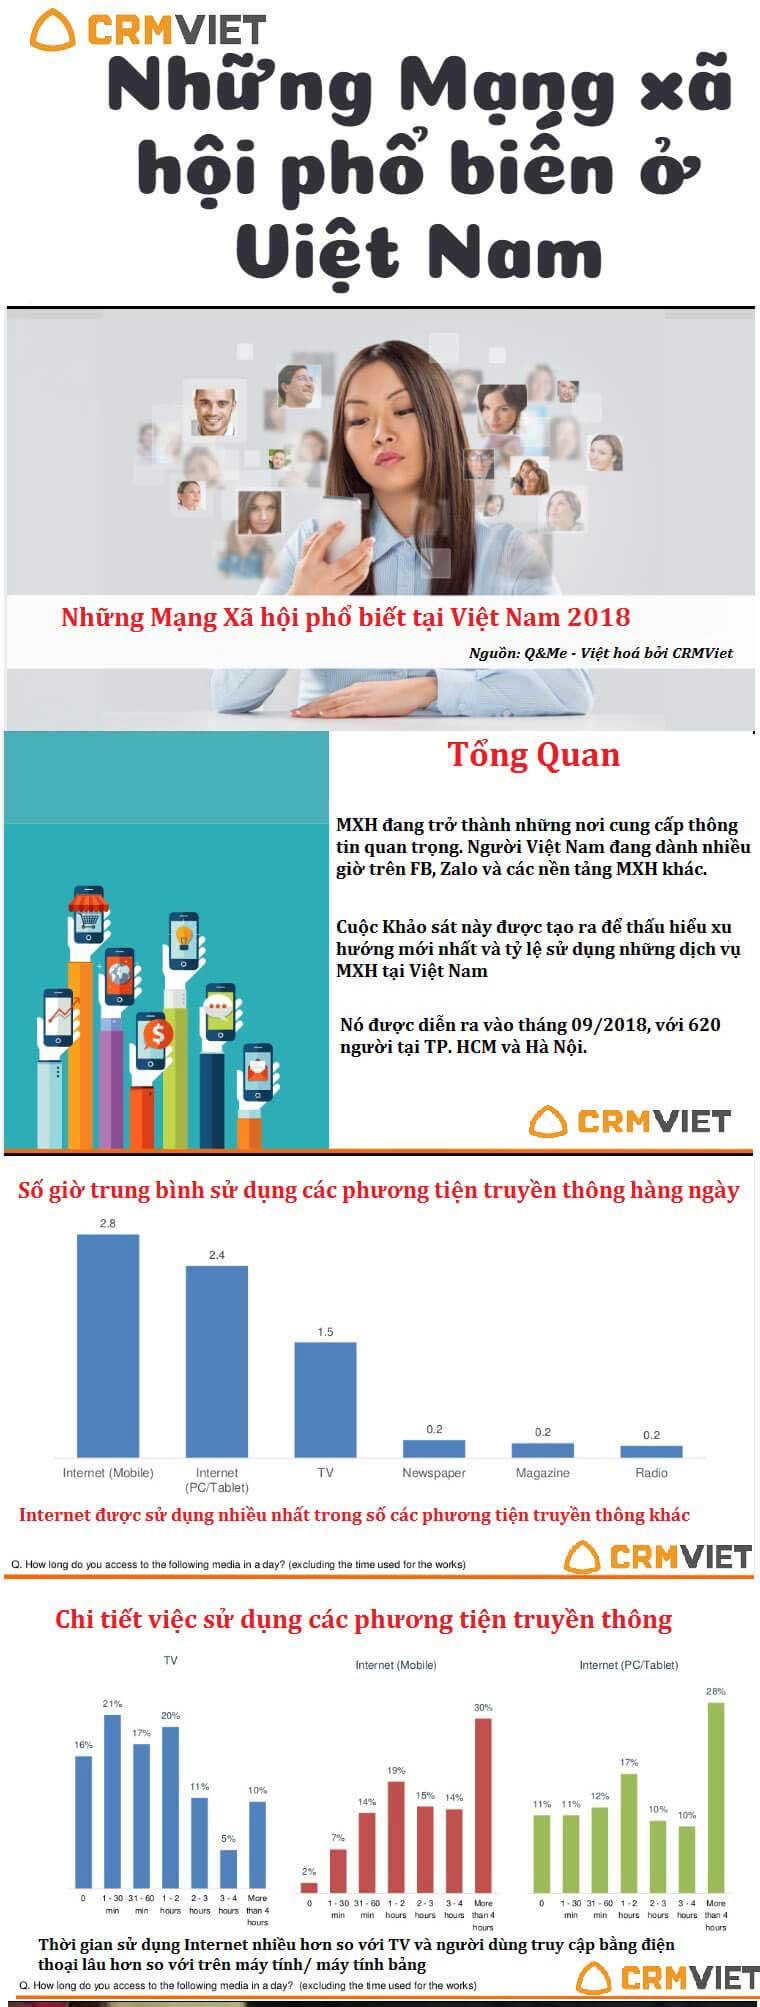 infographic-ve-mang-xa-hoi-1